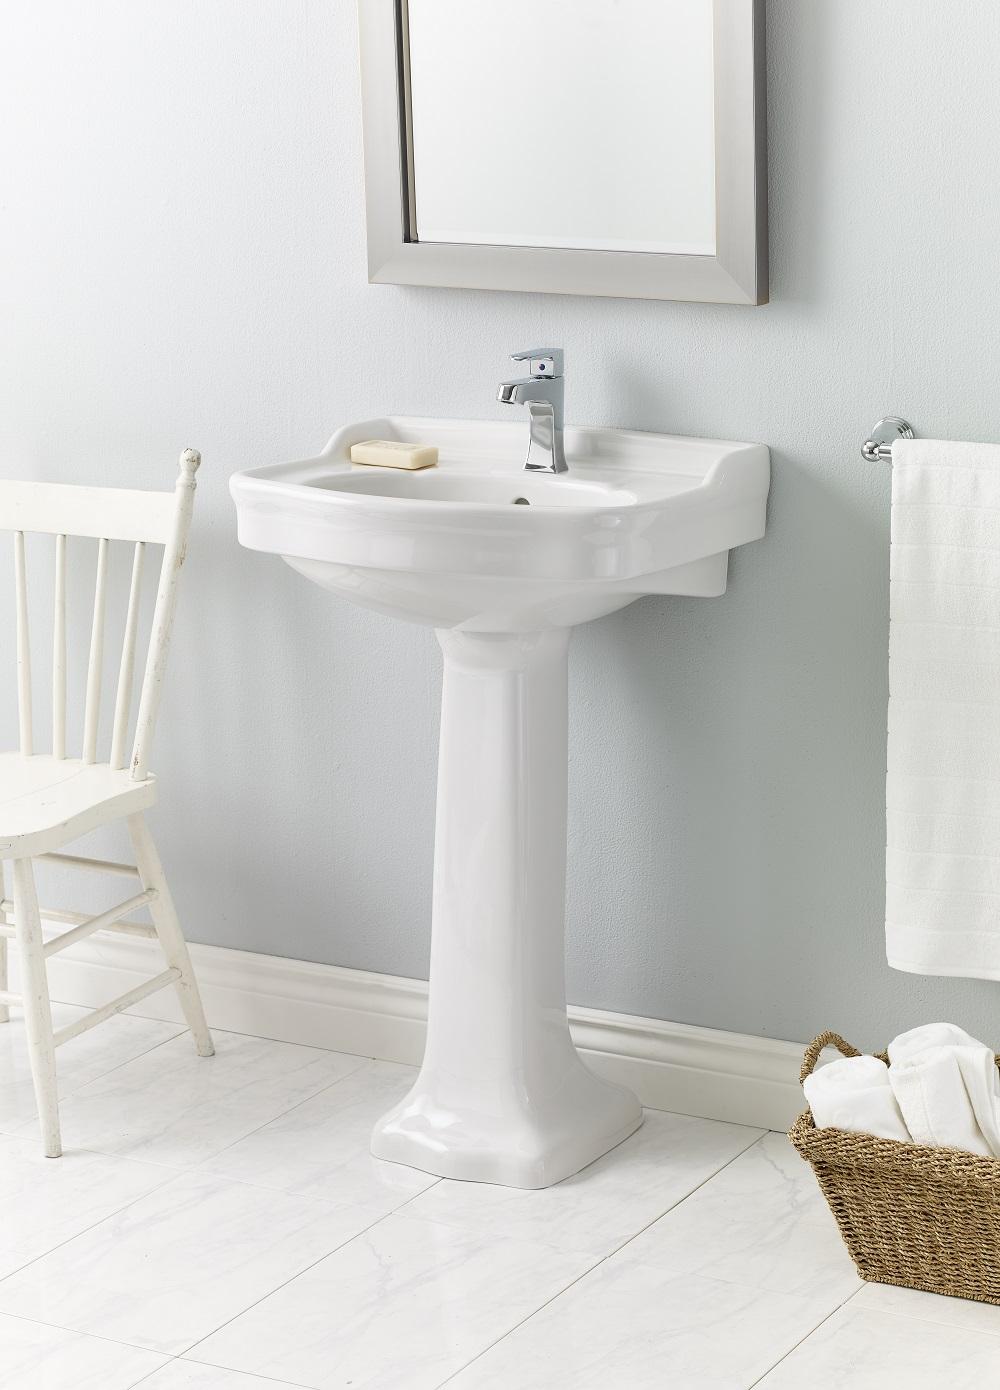 Cheviot Antique Pedestal Bathroom Sink 22 1 2 X 18 1 2 White Lowe S Canada